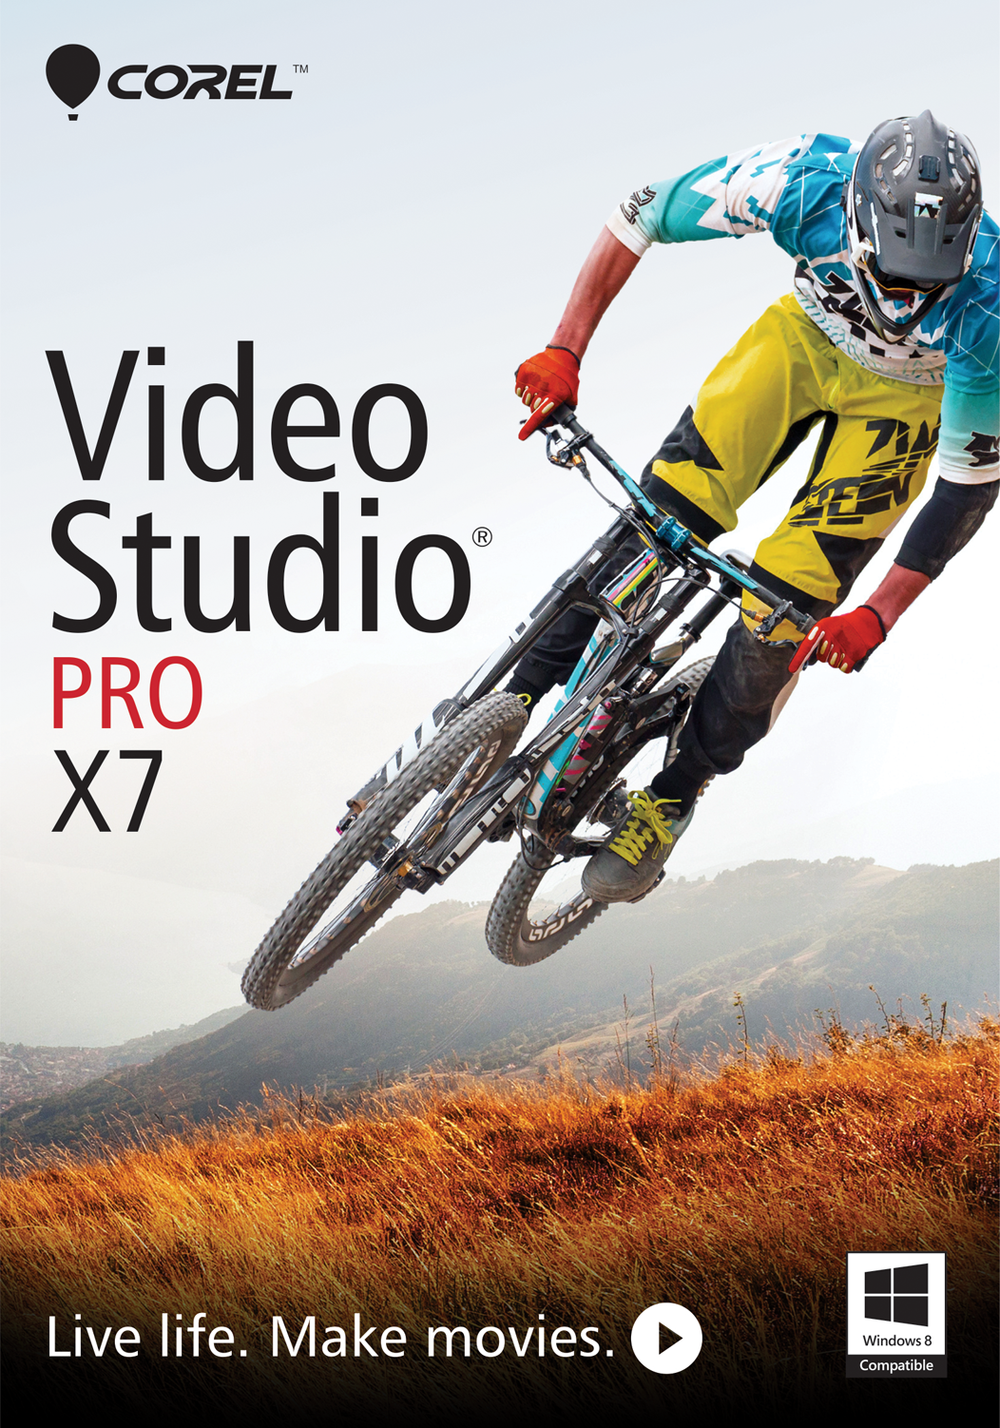 shot of Corel VideoStudio X7 editing software